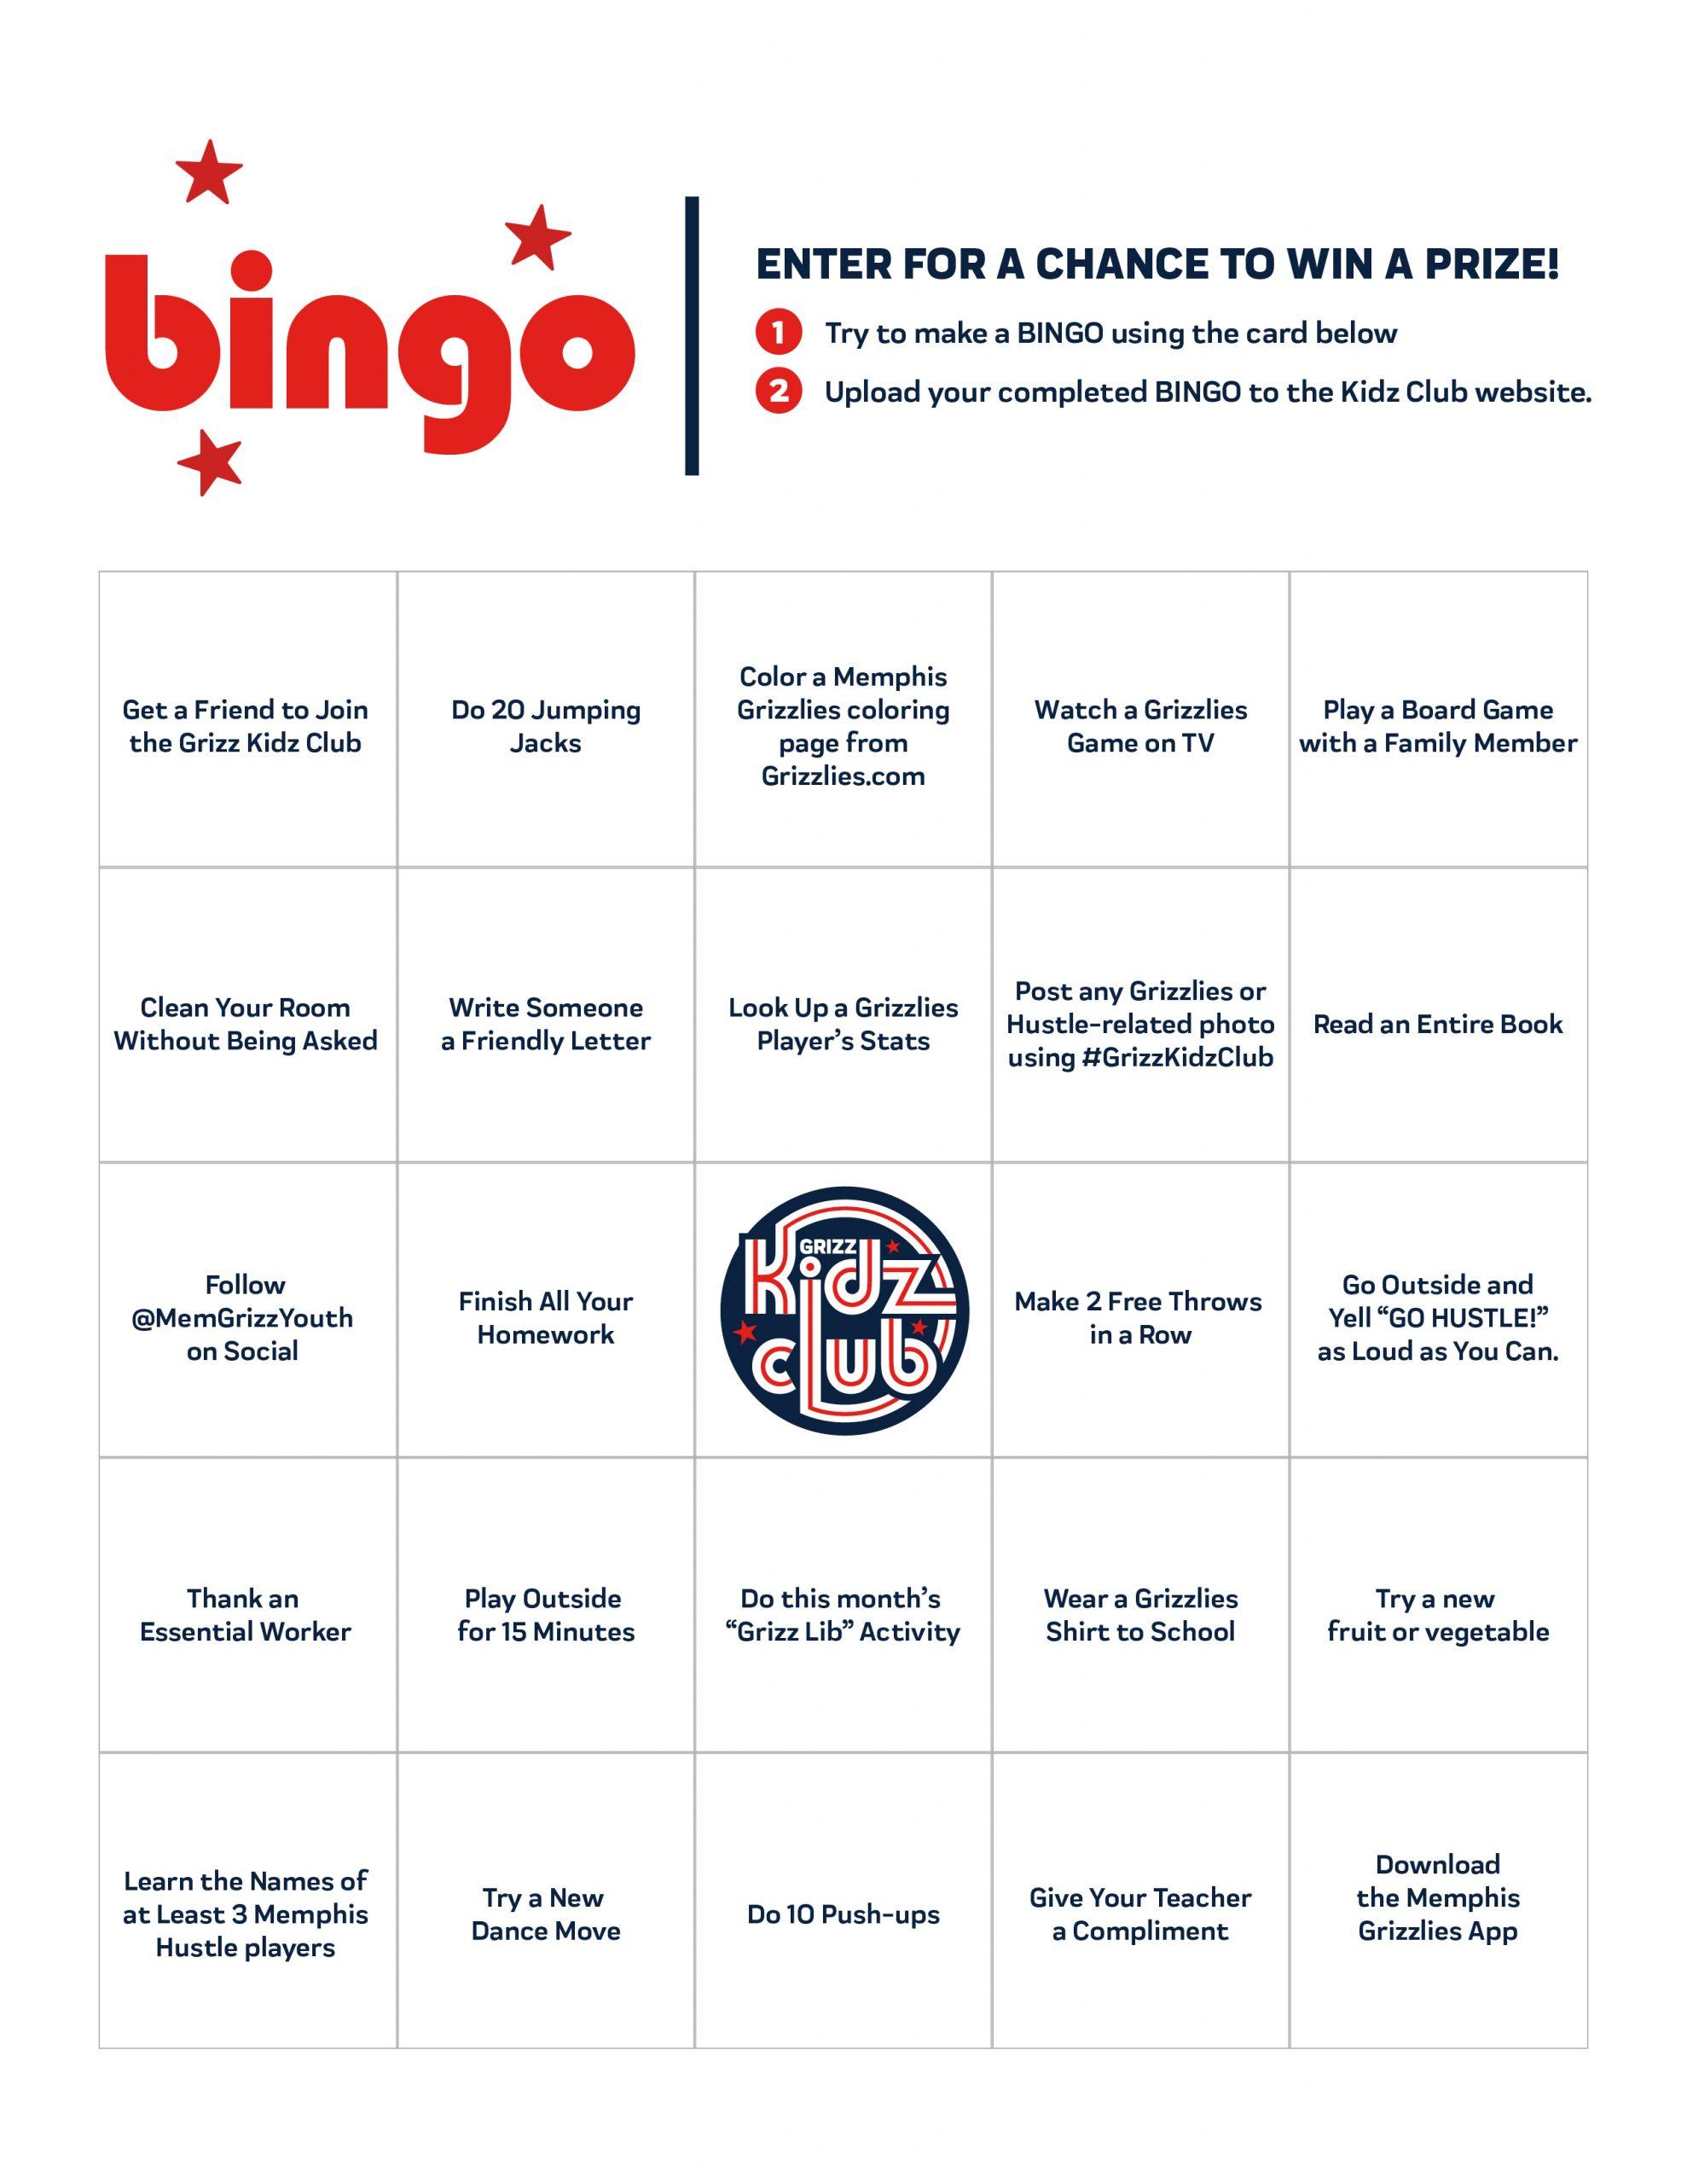 bingo-card-post